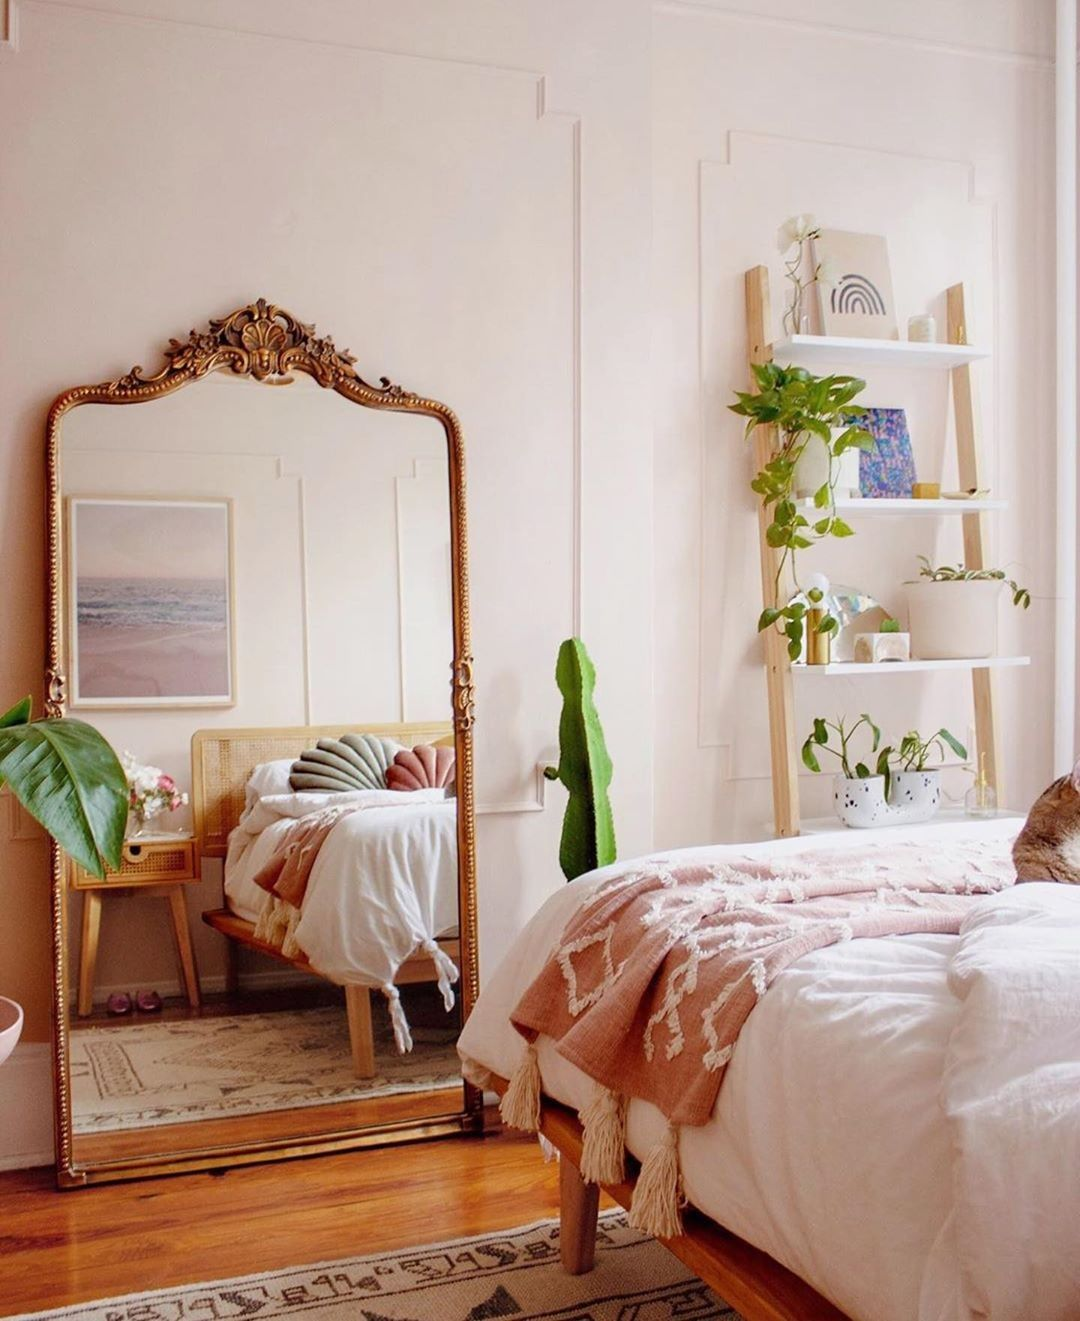 Modern Bohemian Bedroom Decor Ideas Home Decor Bedroom Bedroom Design Home